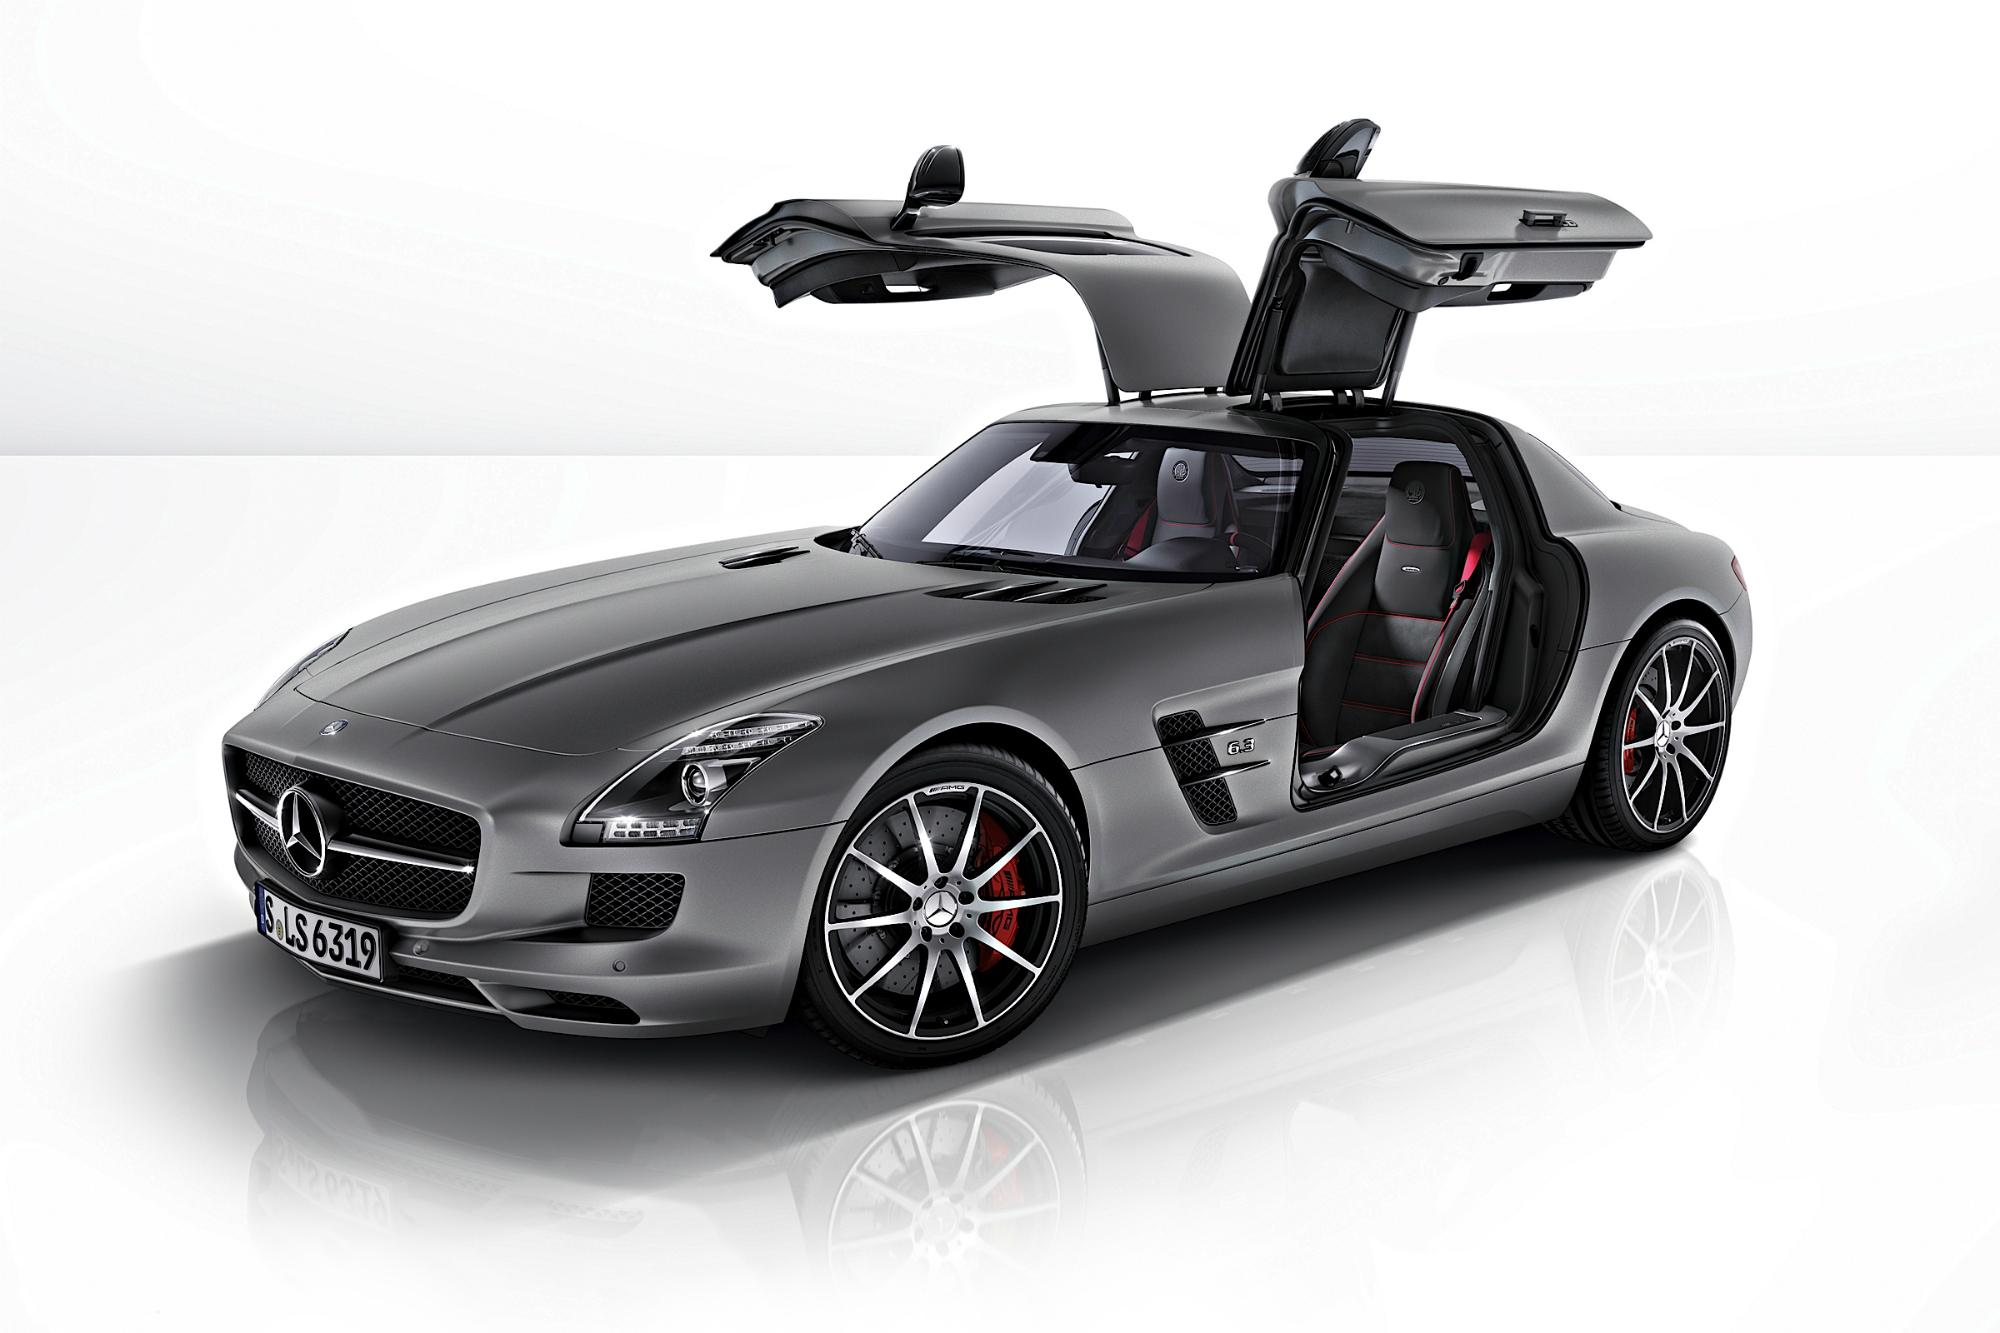 Mercedes benz sls amg clipart vector freeuse Mercedes Benz SLS AMG GT 2013 | Gallery Yopriceville - High ... vector freeuse